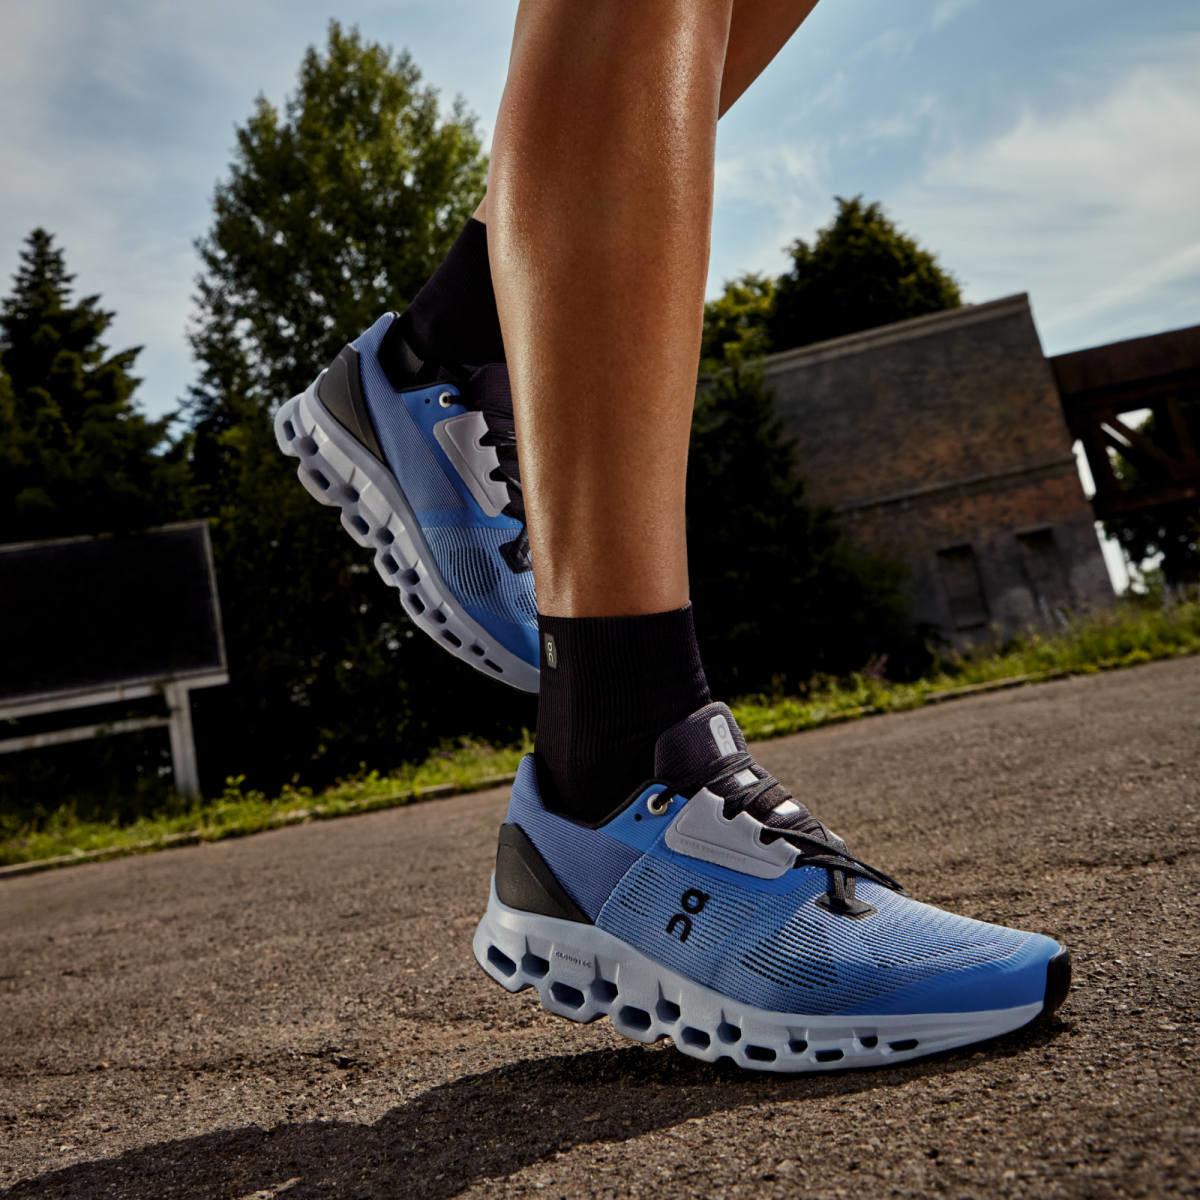 model running in the sneakers in blue